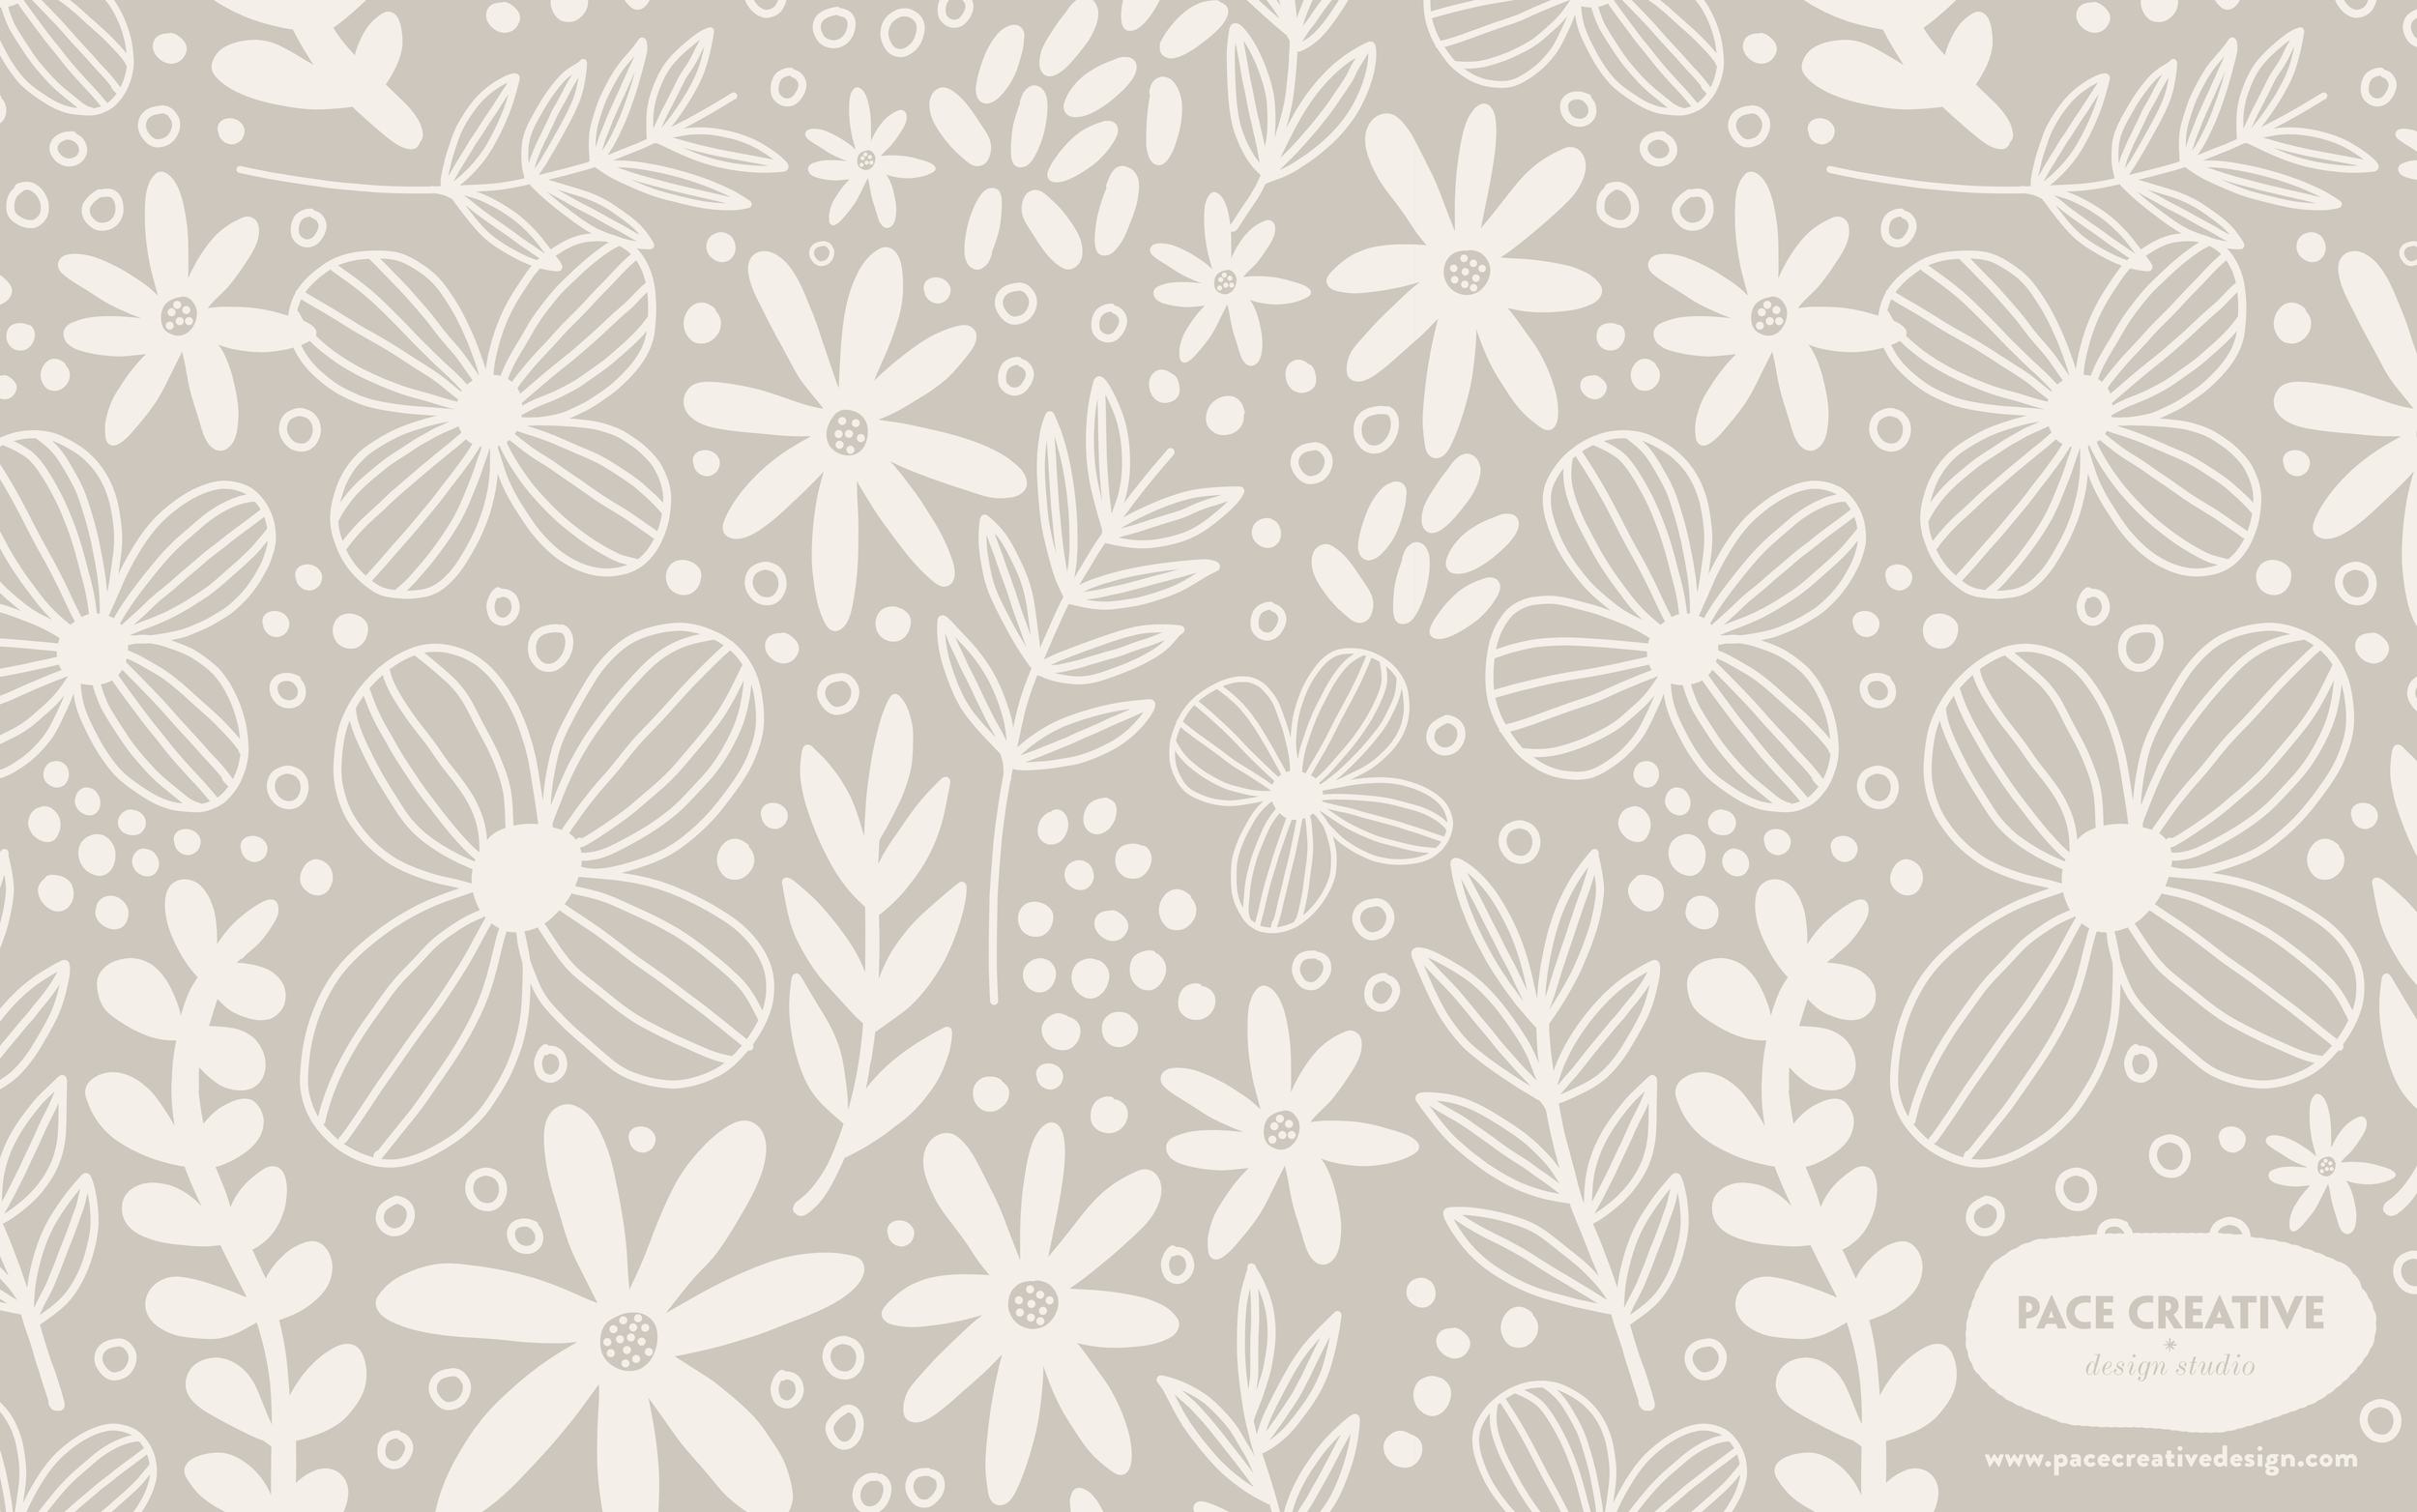 Floral Dreams | Free Desktop Wallpaper design by Pace Creative Design Studio